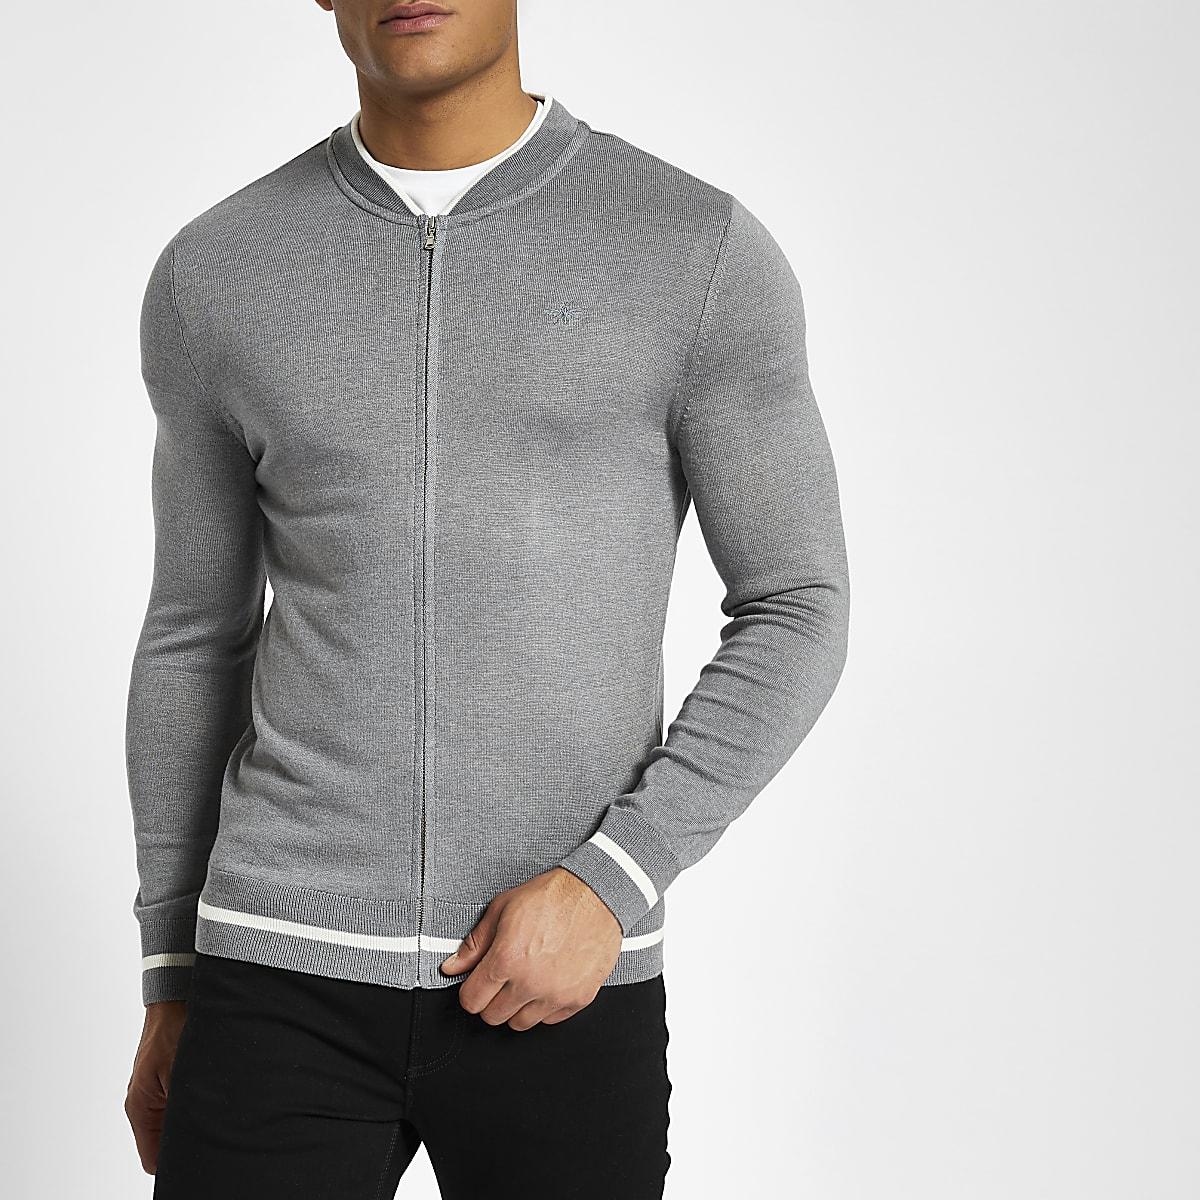 Grey zip front slim fit bomber cardigan